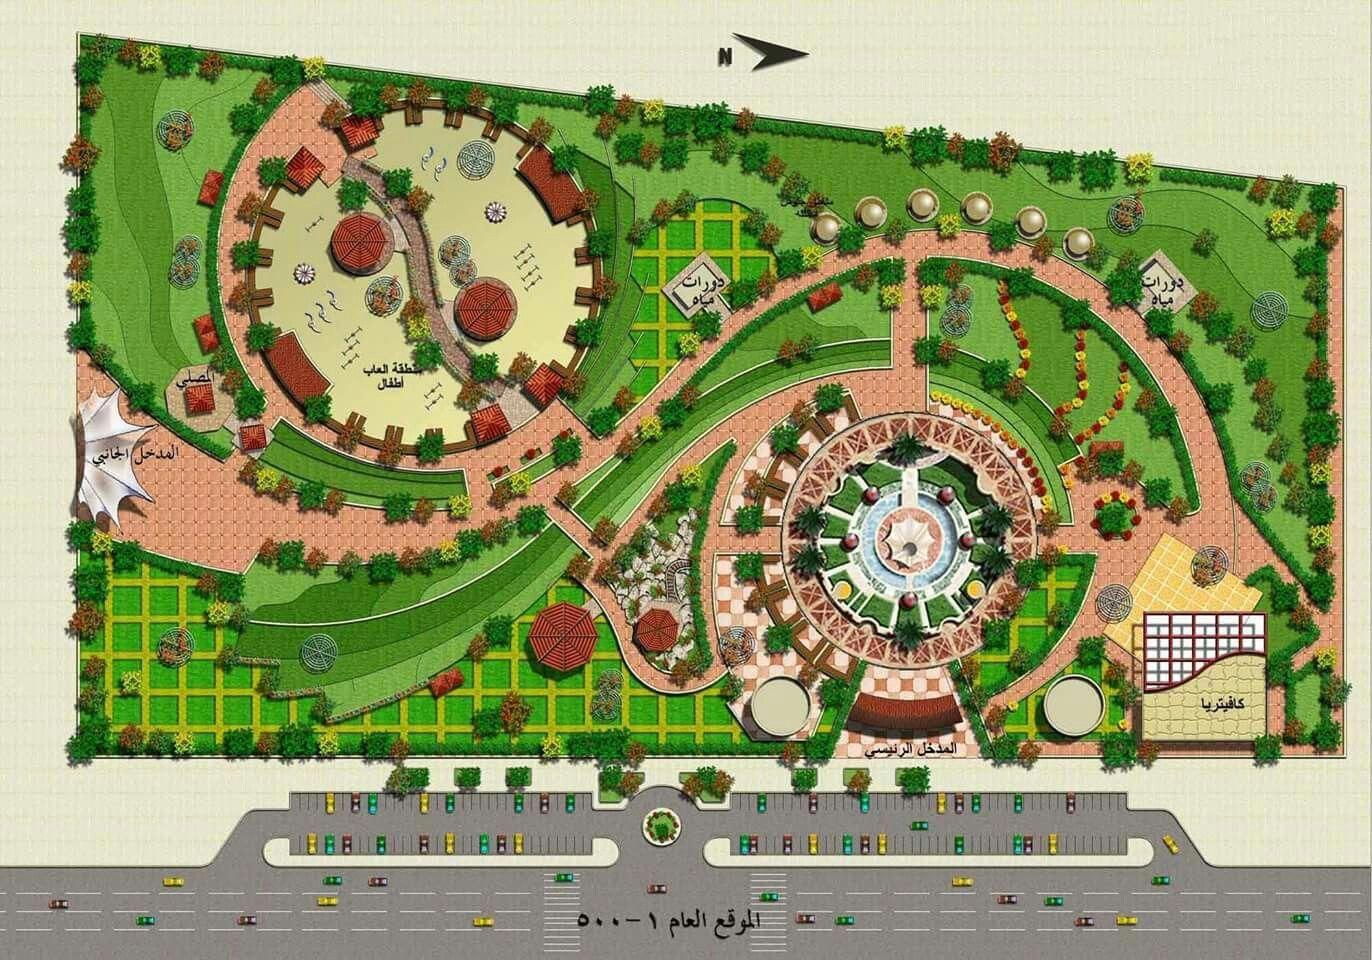 уверен, план парка картинки также двухэтажные корпуса